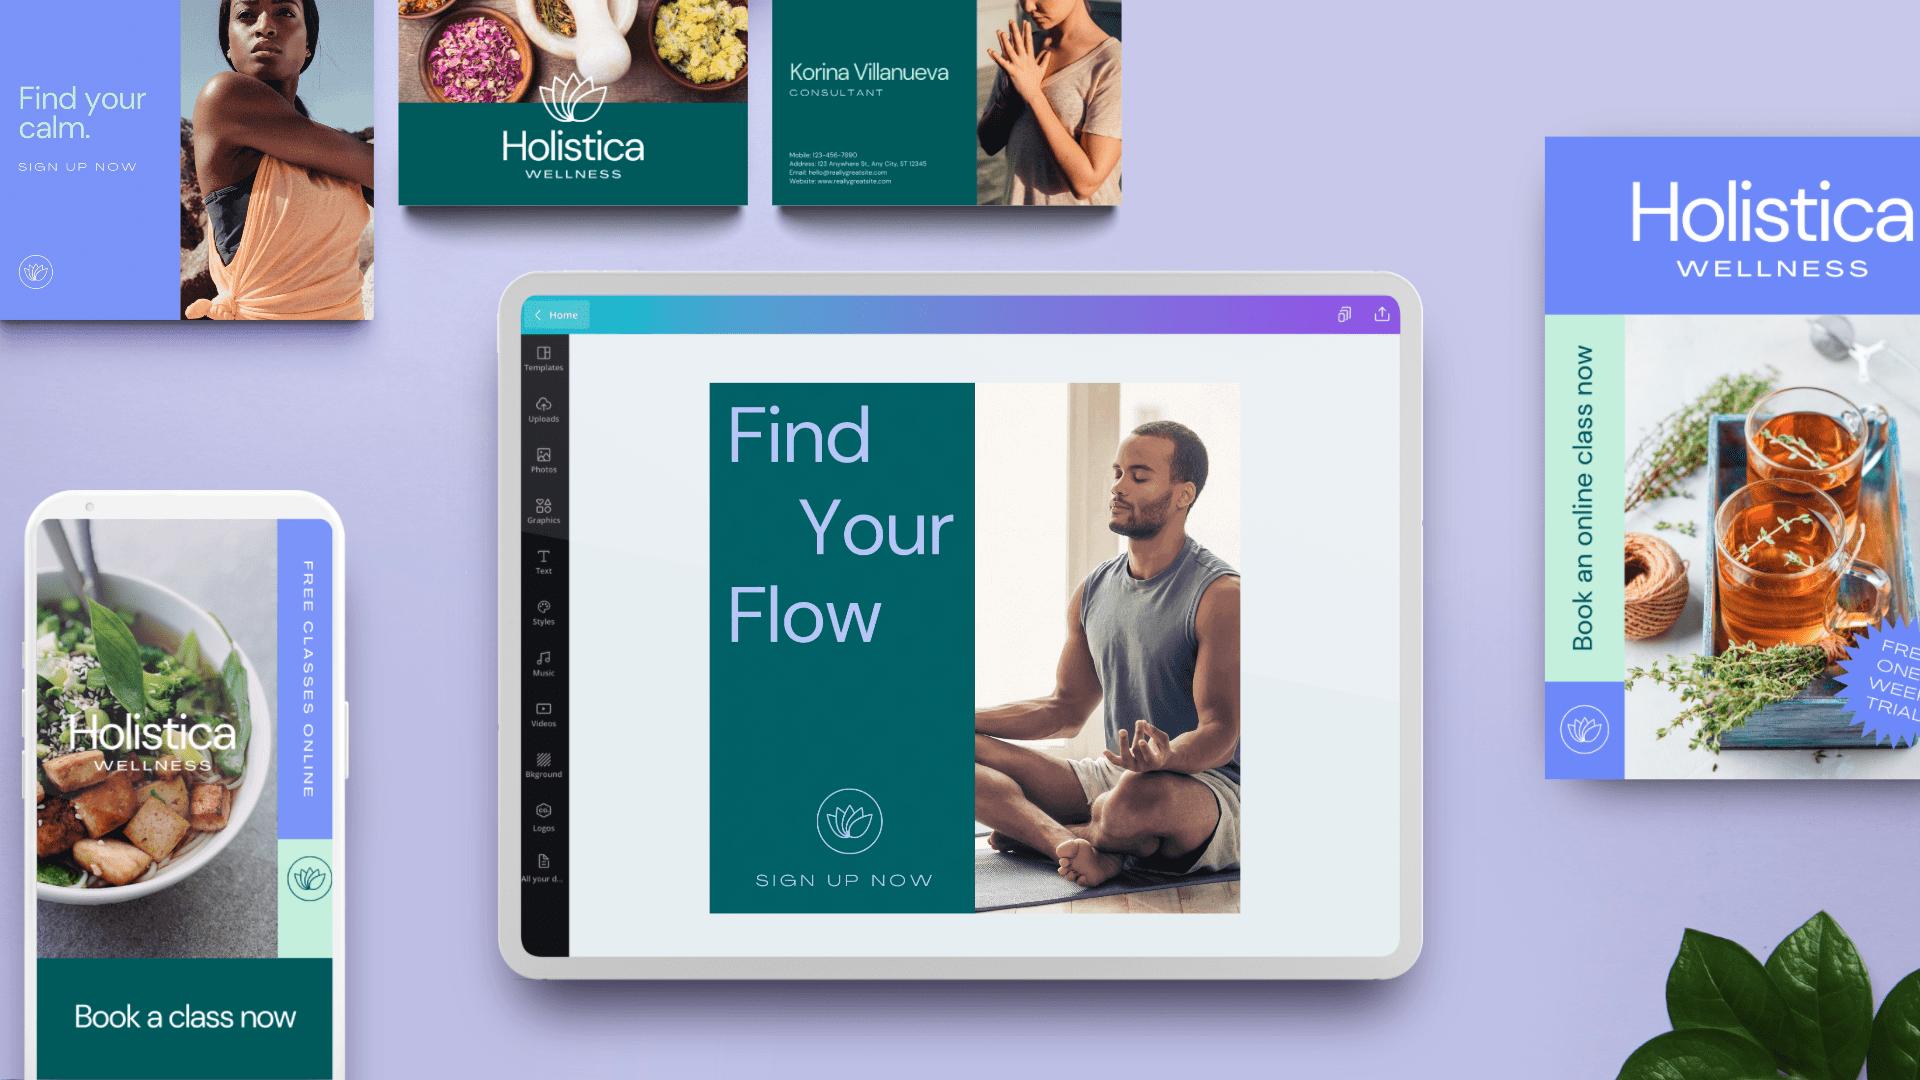 Canva Pro Fake Brand - Wellness Holistica Yoga (3)